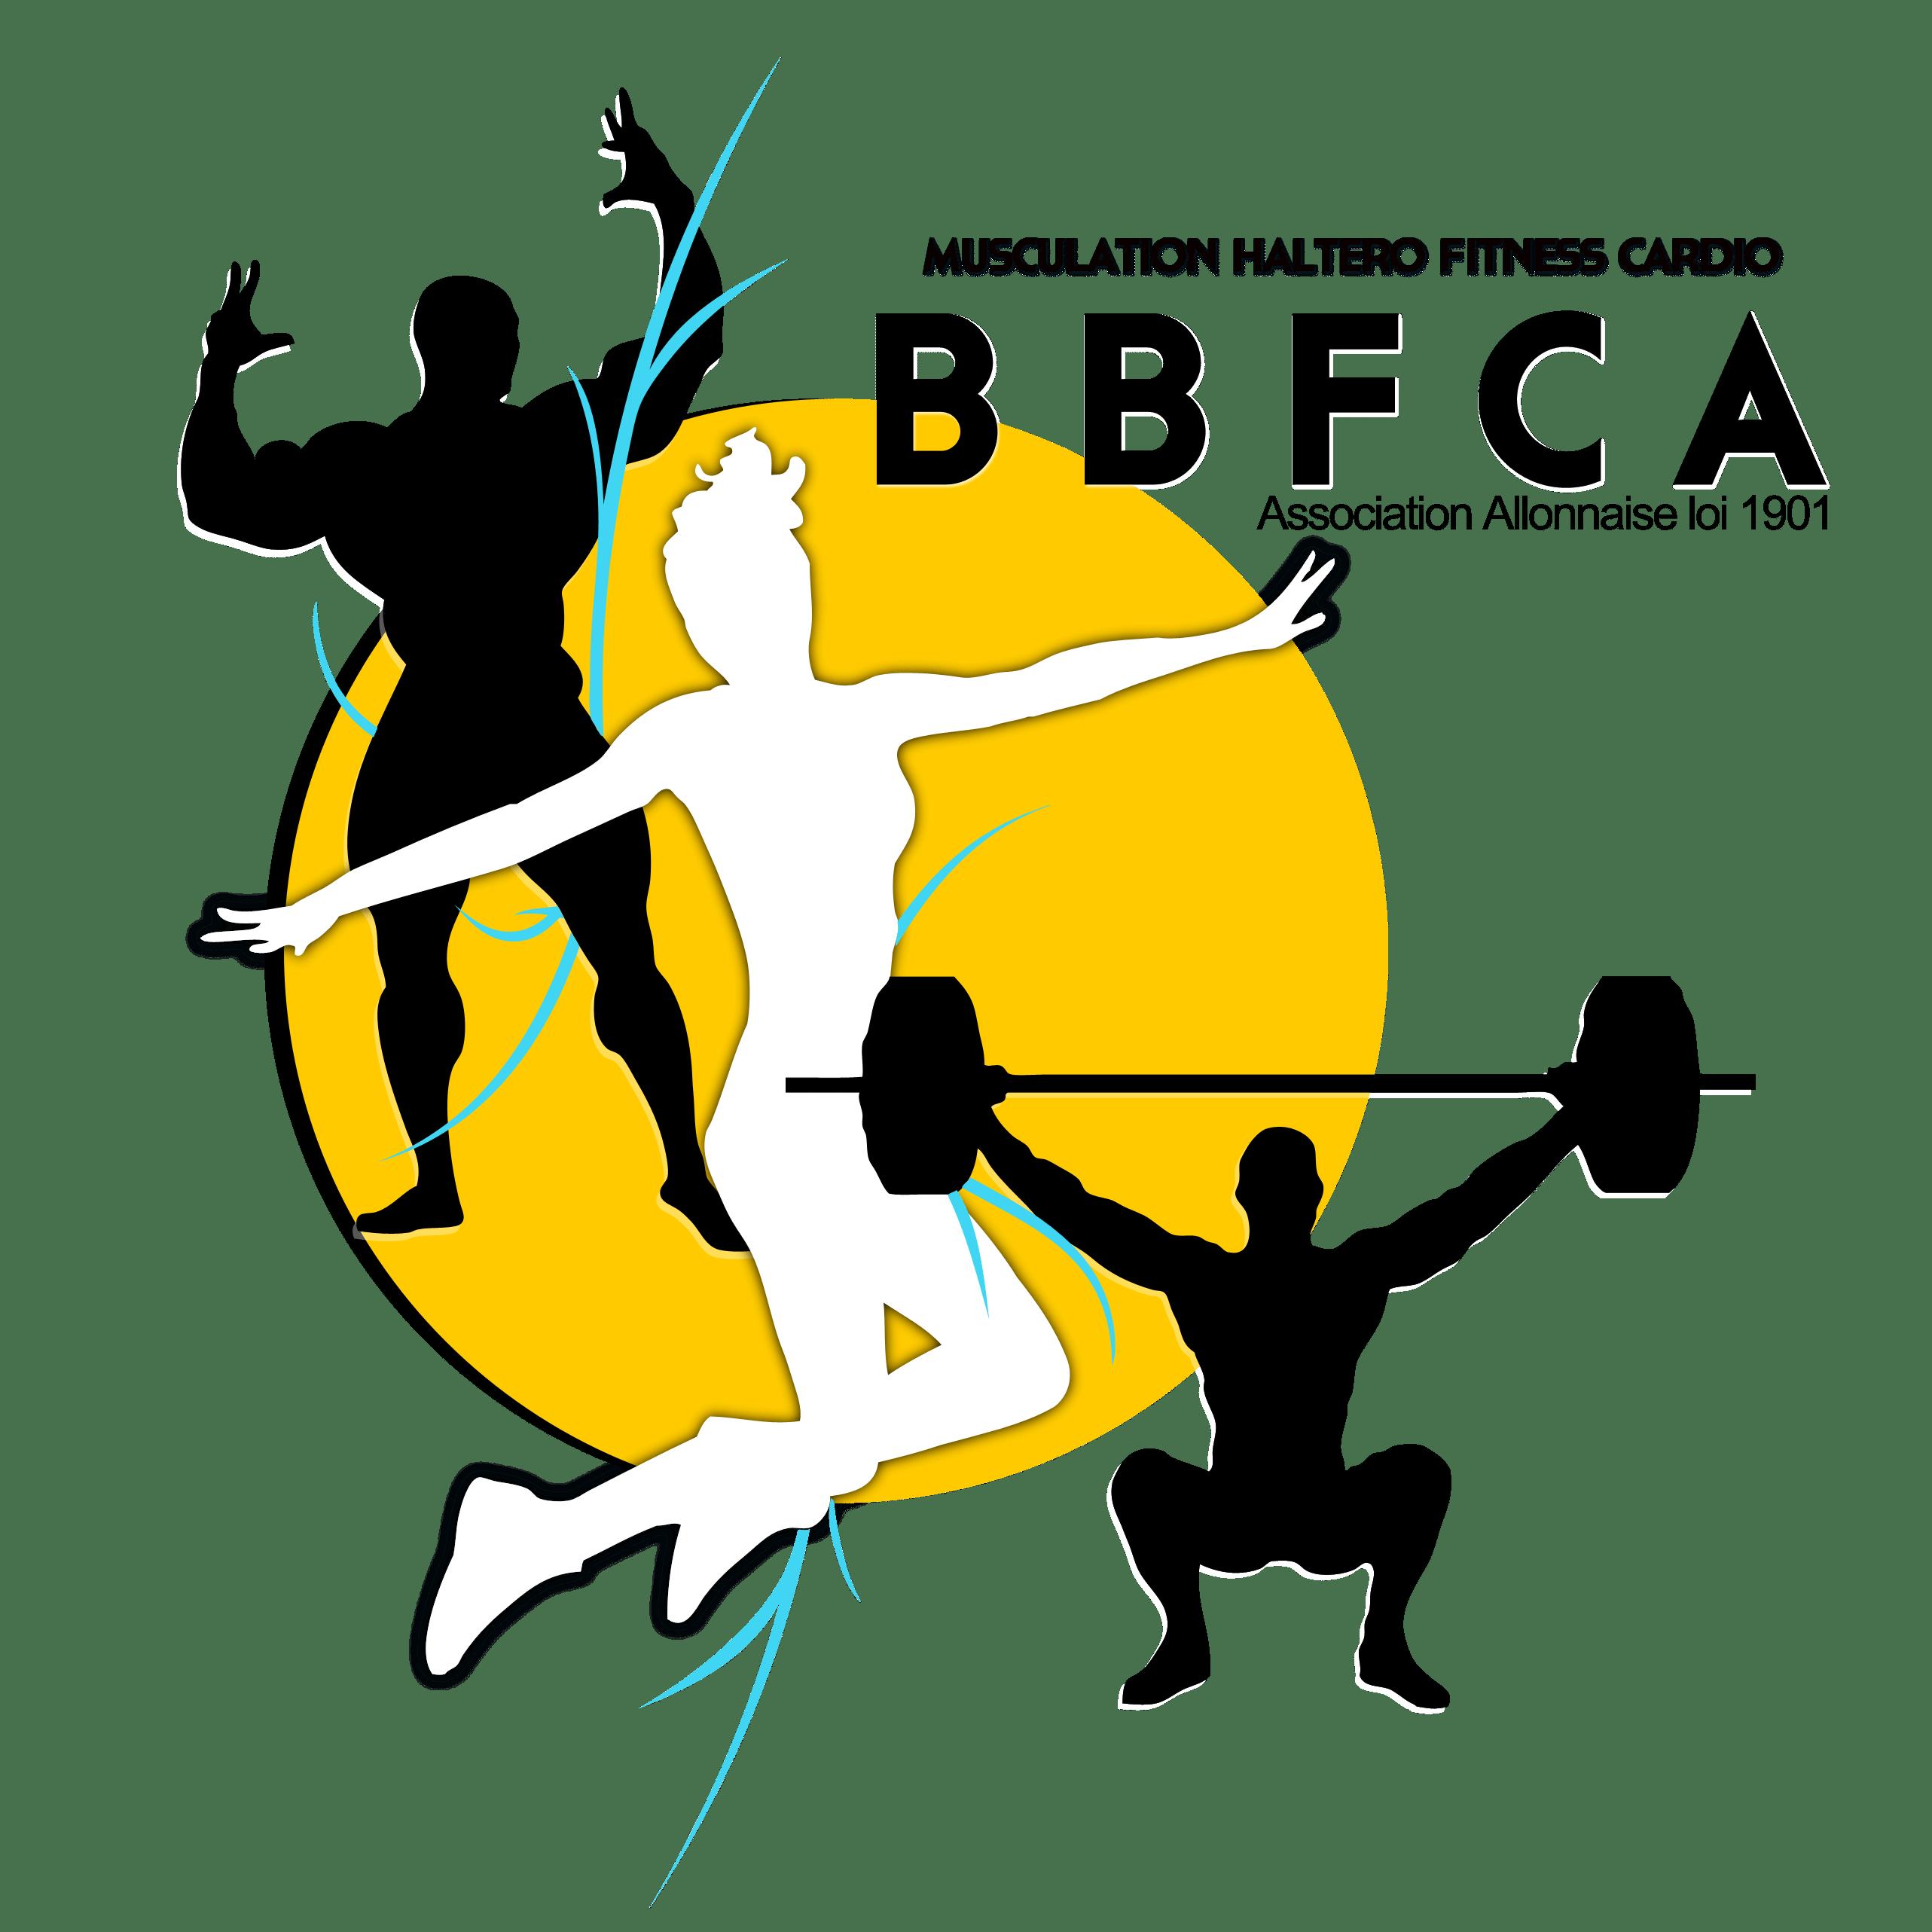 logo bbfca 2015 CARRE_white